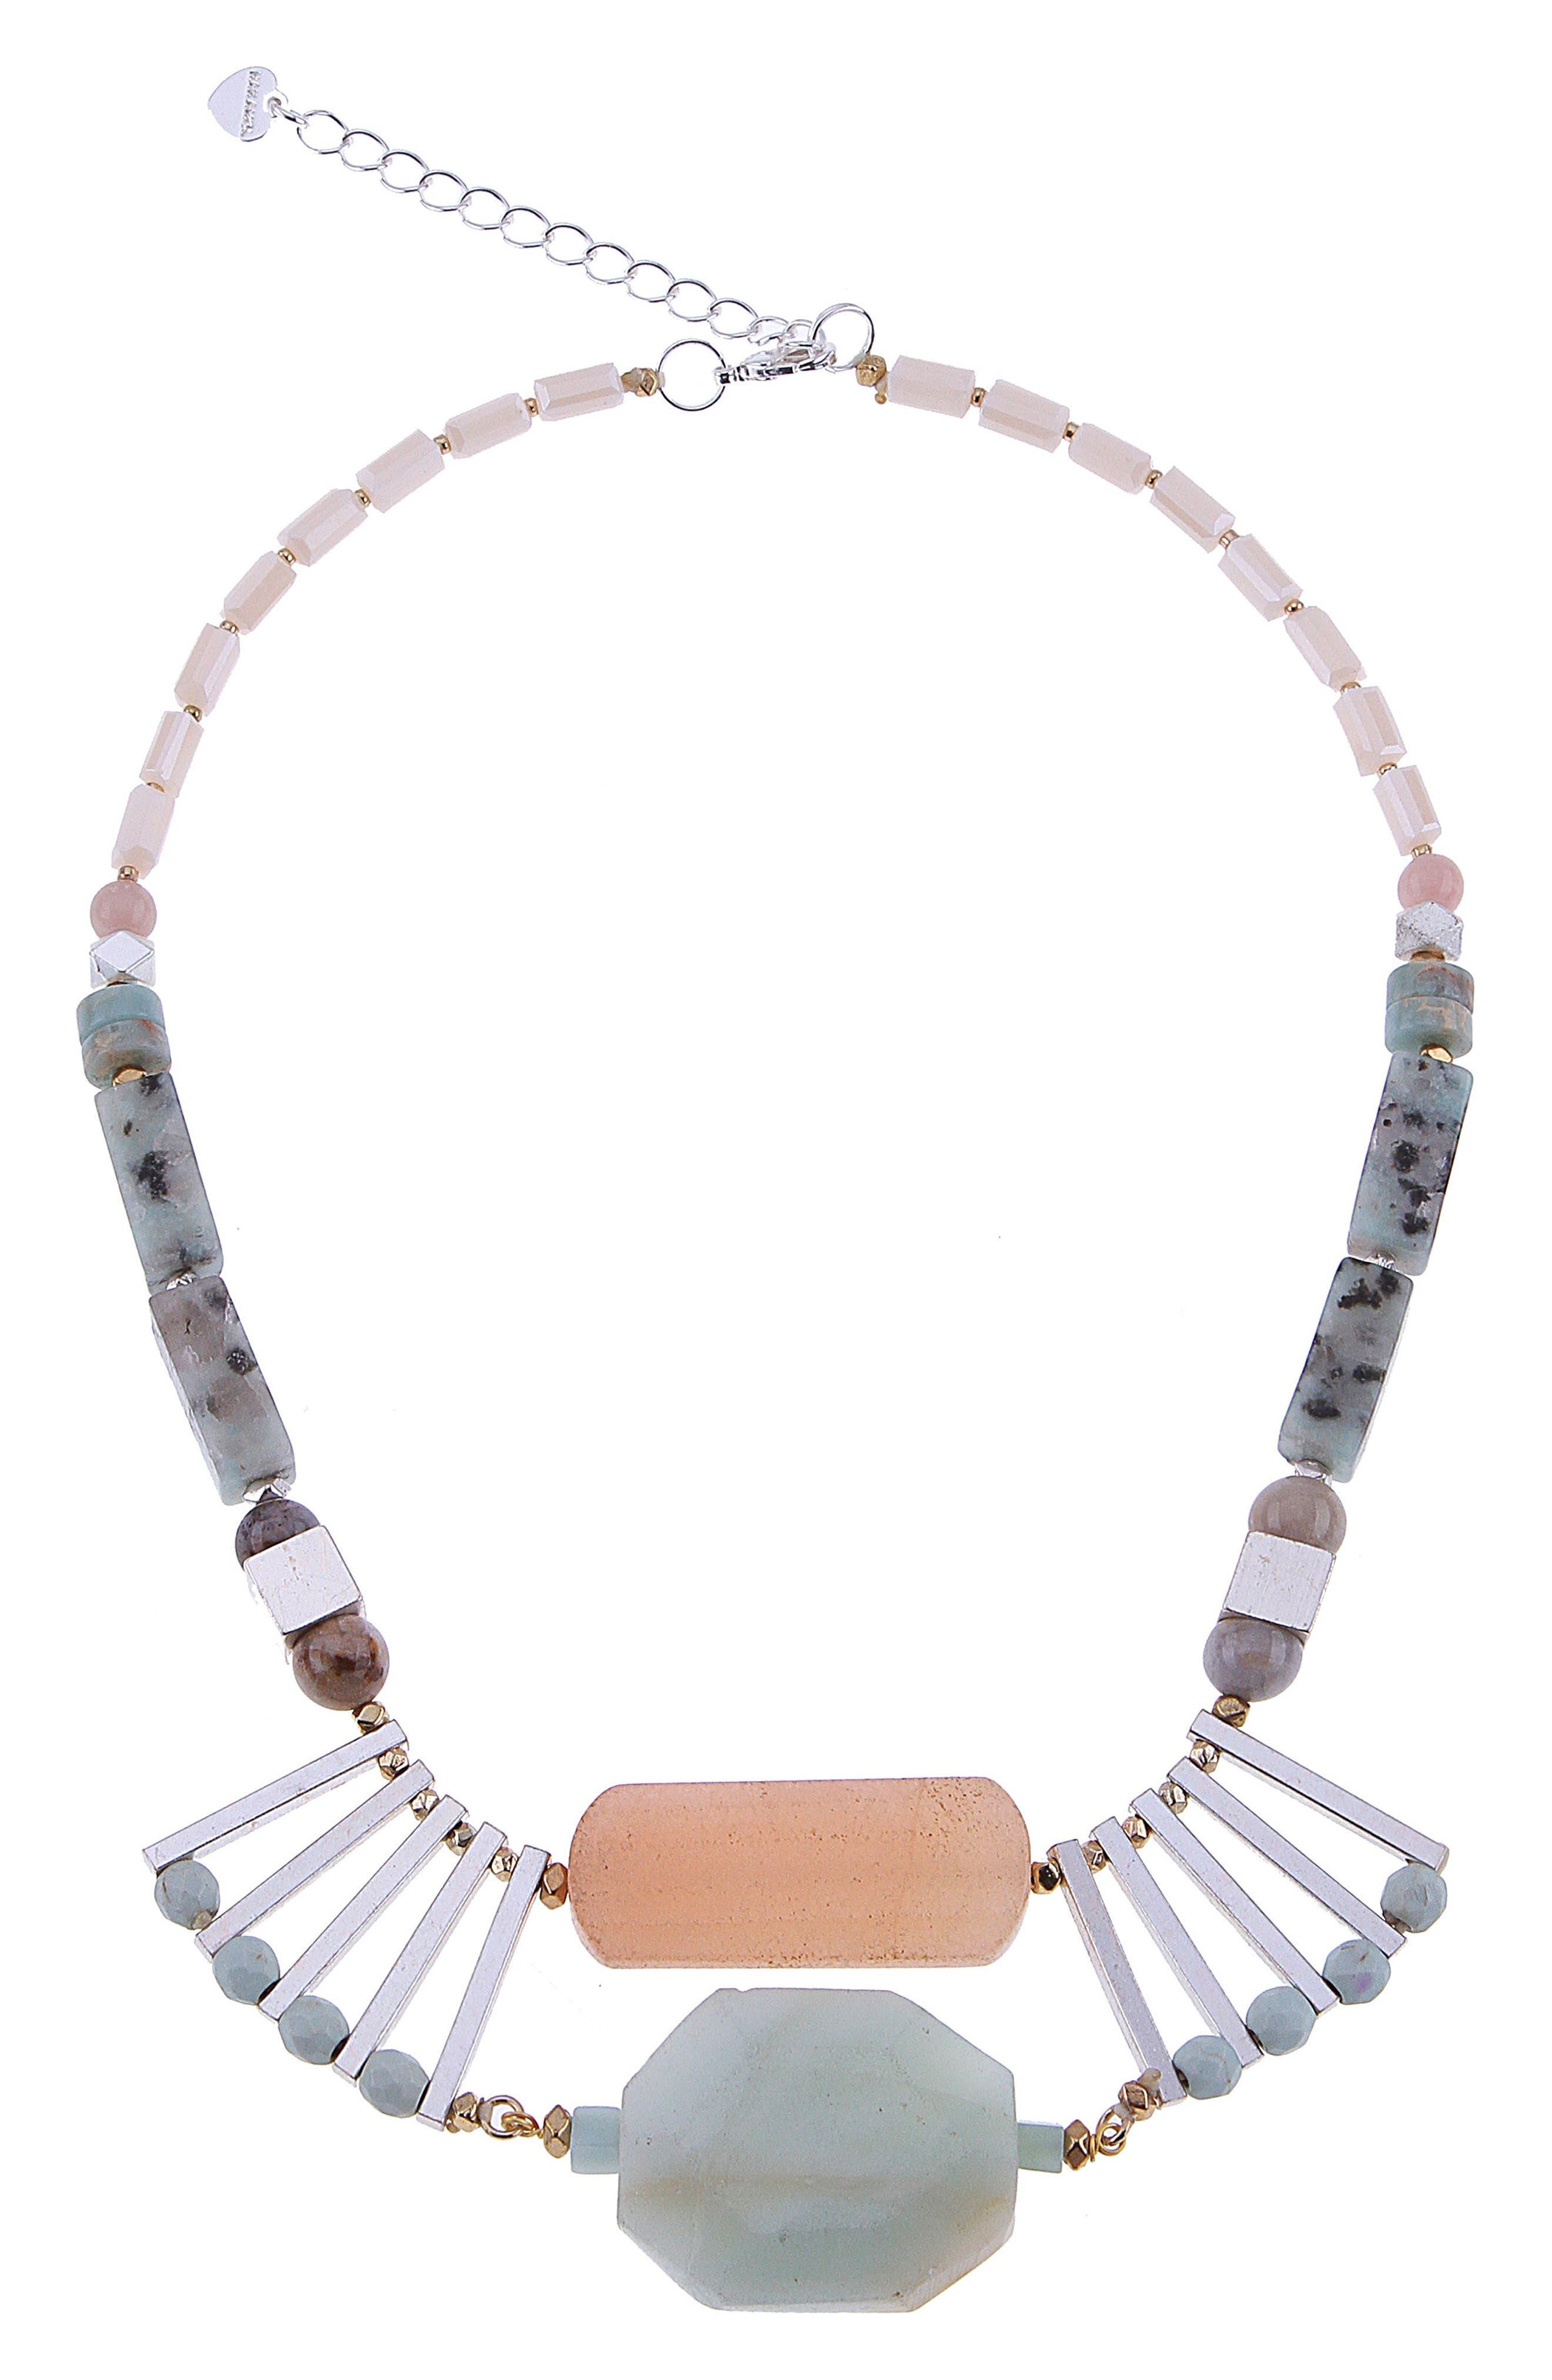 Agate & Amazonite Chunk Stone Statement Necklace,                             Main thumbnail 1, color,                             Aqua